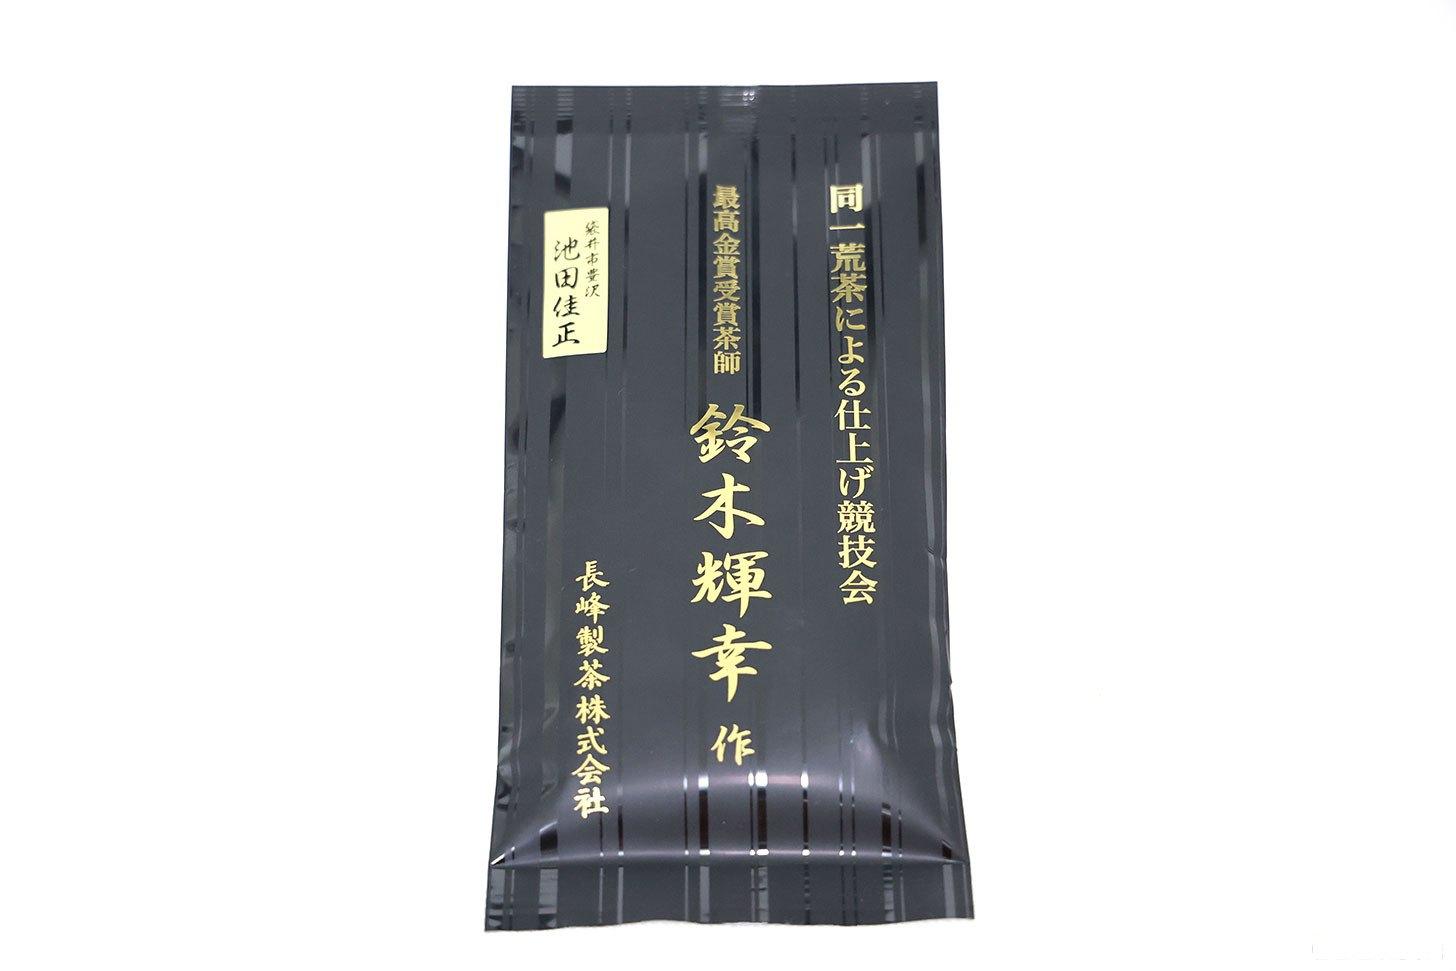 長峰製茶工場茶氏・鈴木照幸作の深むし煎茶